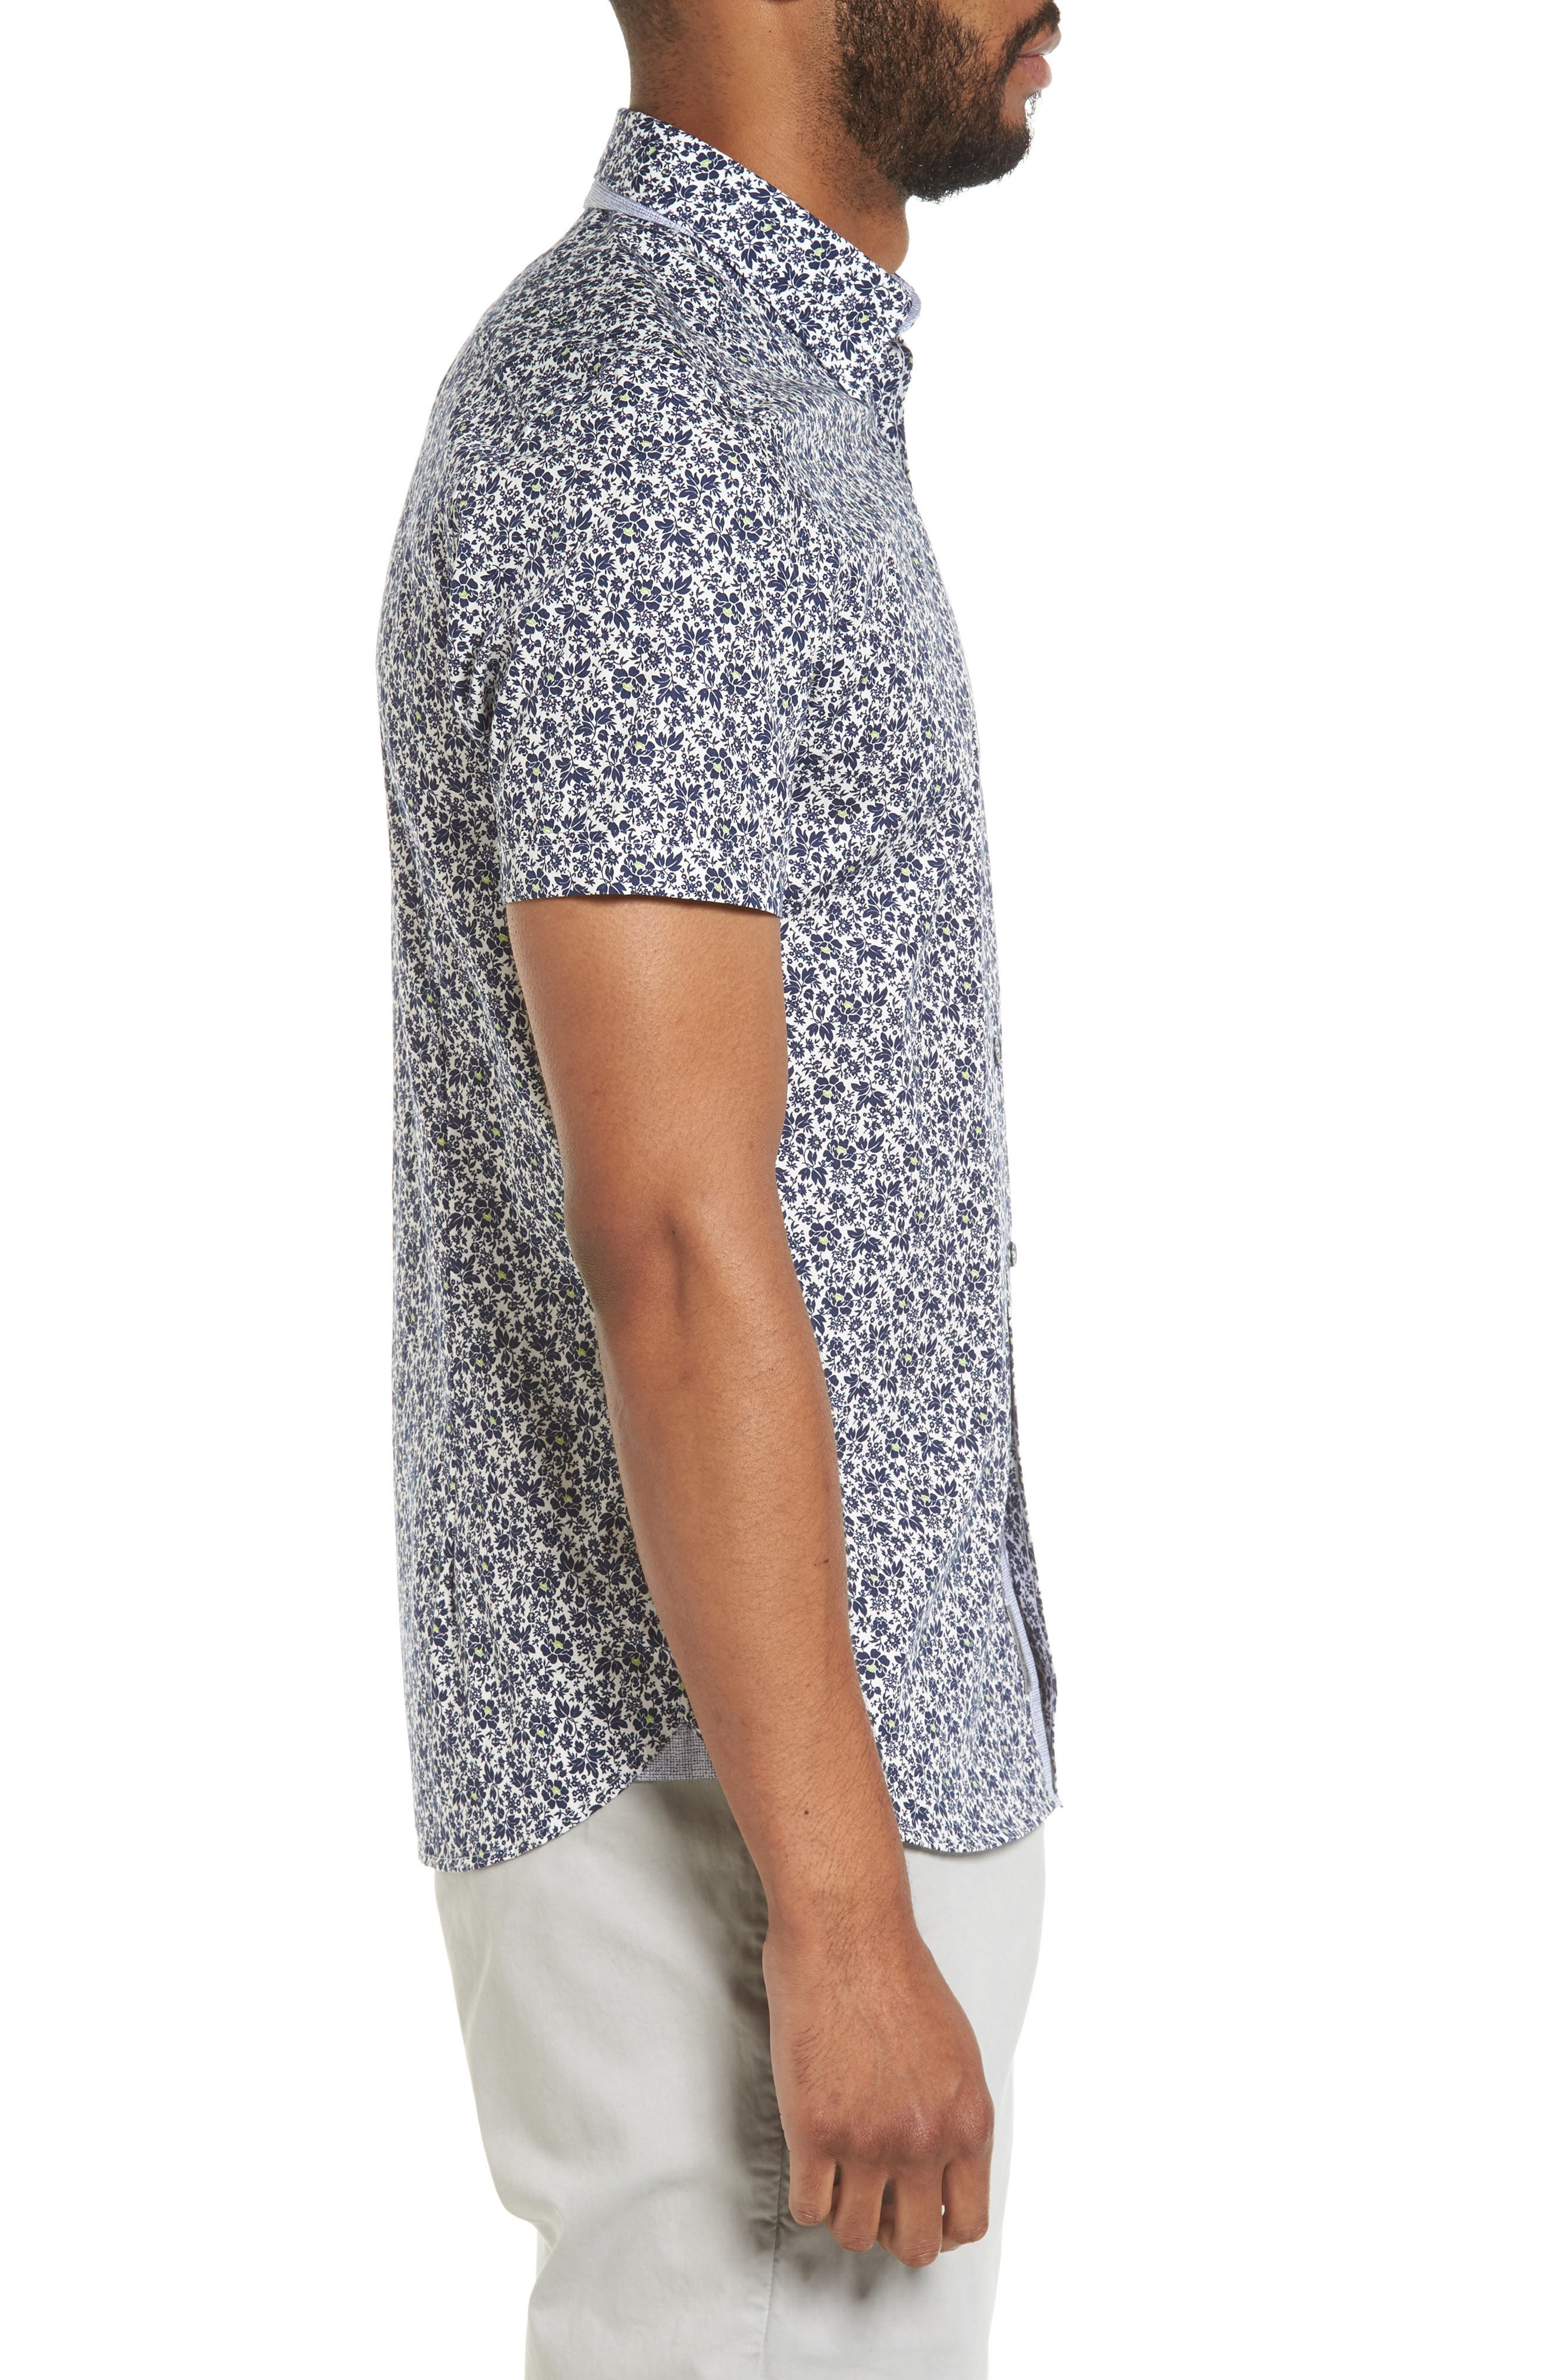 Alygar Slim Fit Floral Woven Shirt,                             Alternate thumbnail 3, color,                             402